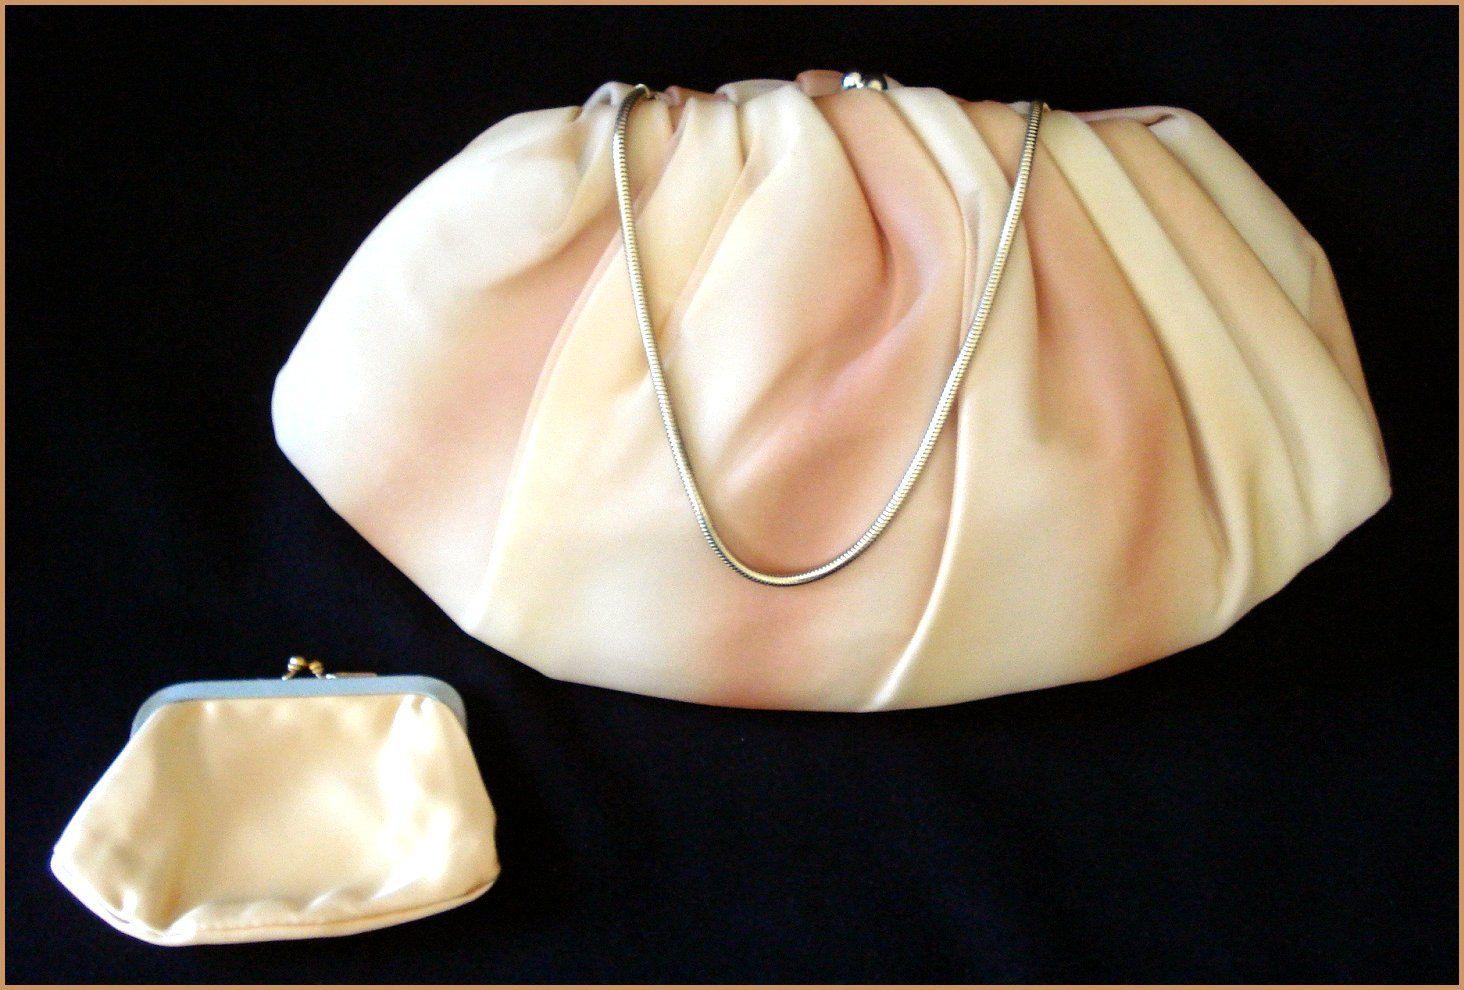 Pastel Orange Purse Clutch Handbag -  by Harry Levine Designer - Excellent Vintage Condition